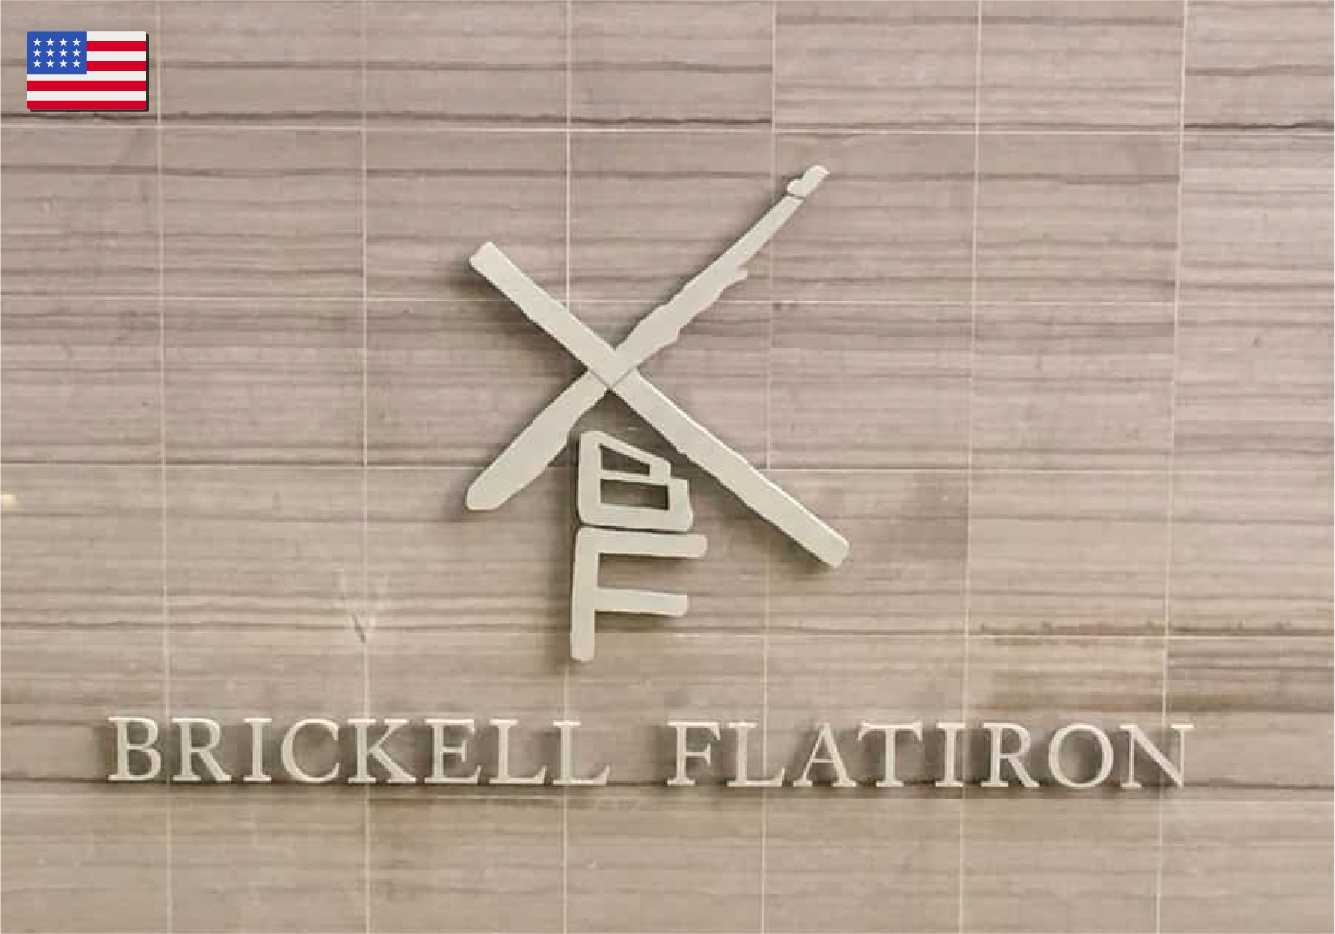 FLATIRON BRICKELL